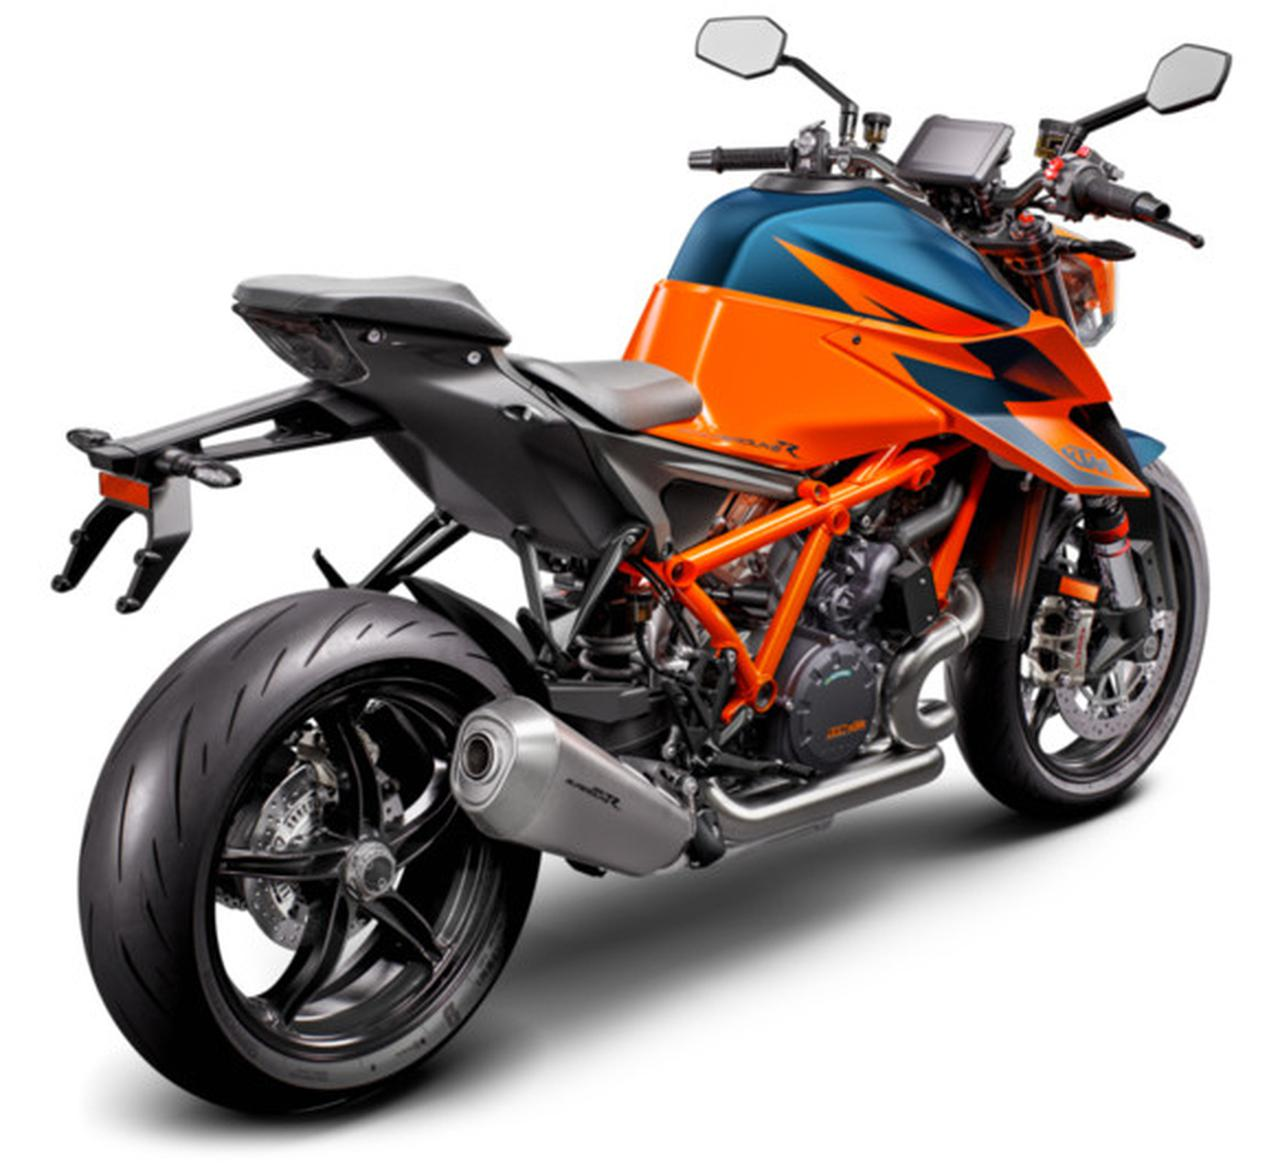 Images : 12番目の画像 - KTM「1290 SUPER DUKE R」の写真を全て見る! - webオートバイ